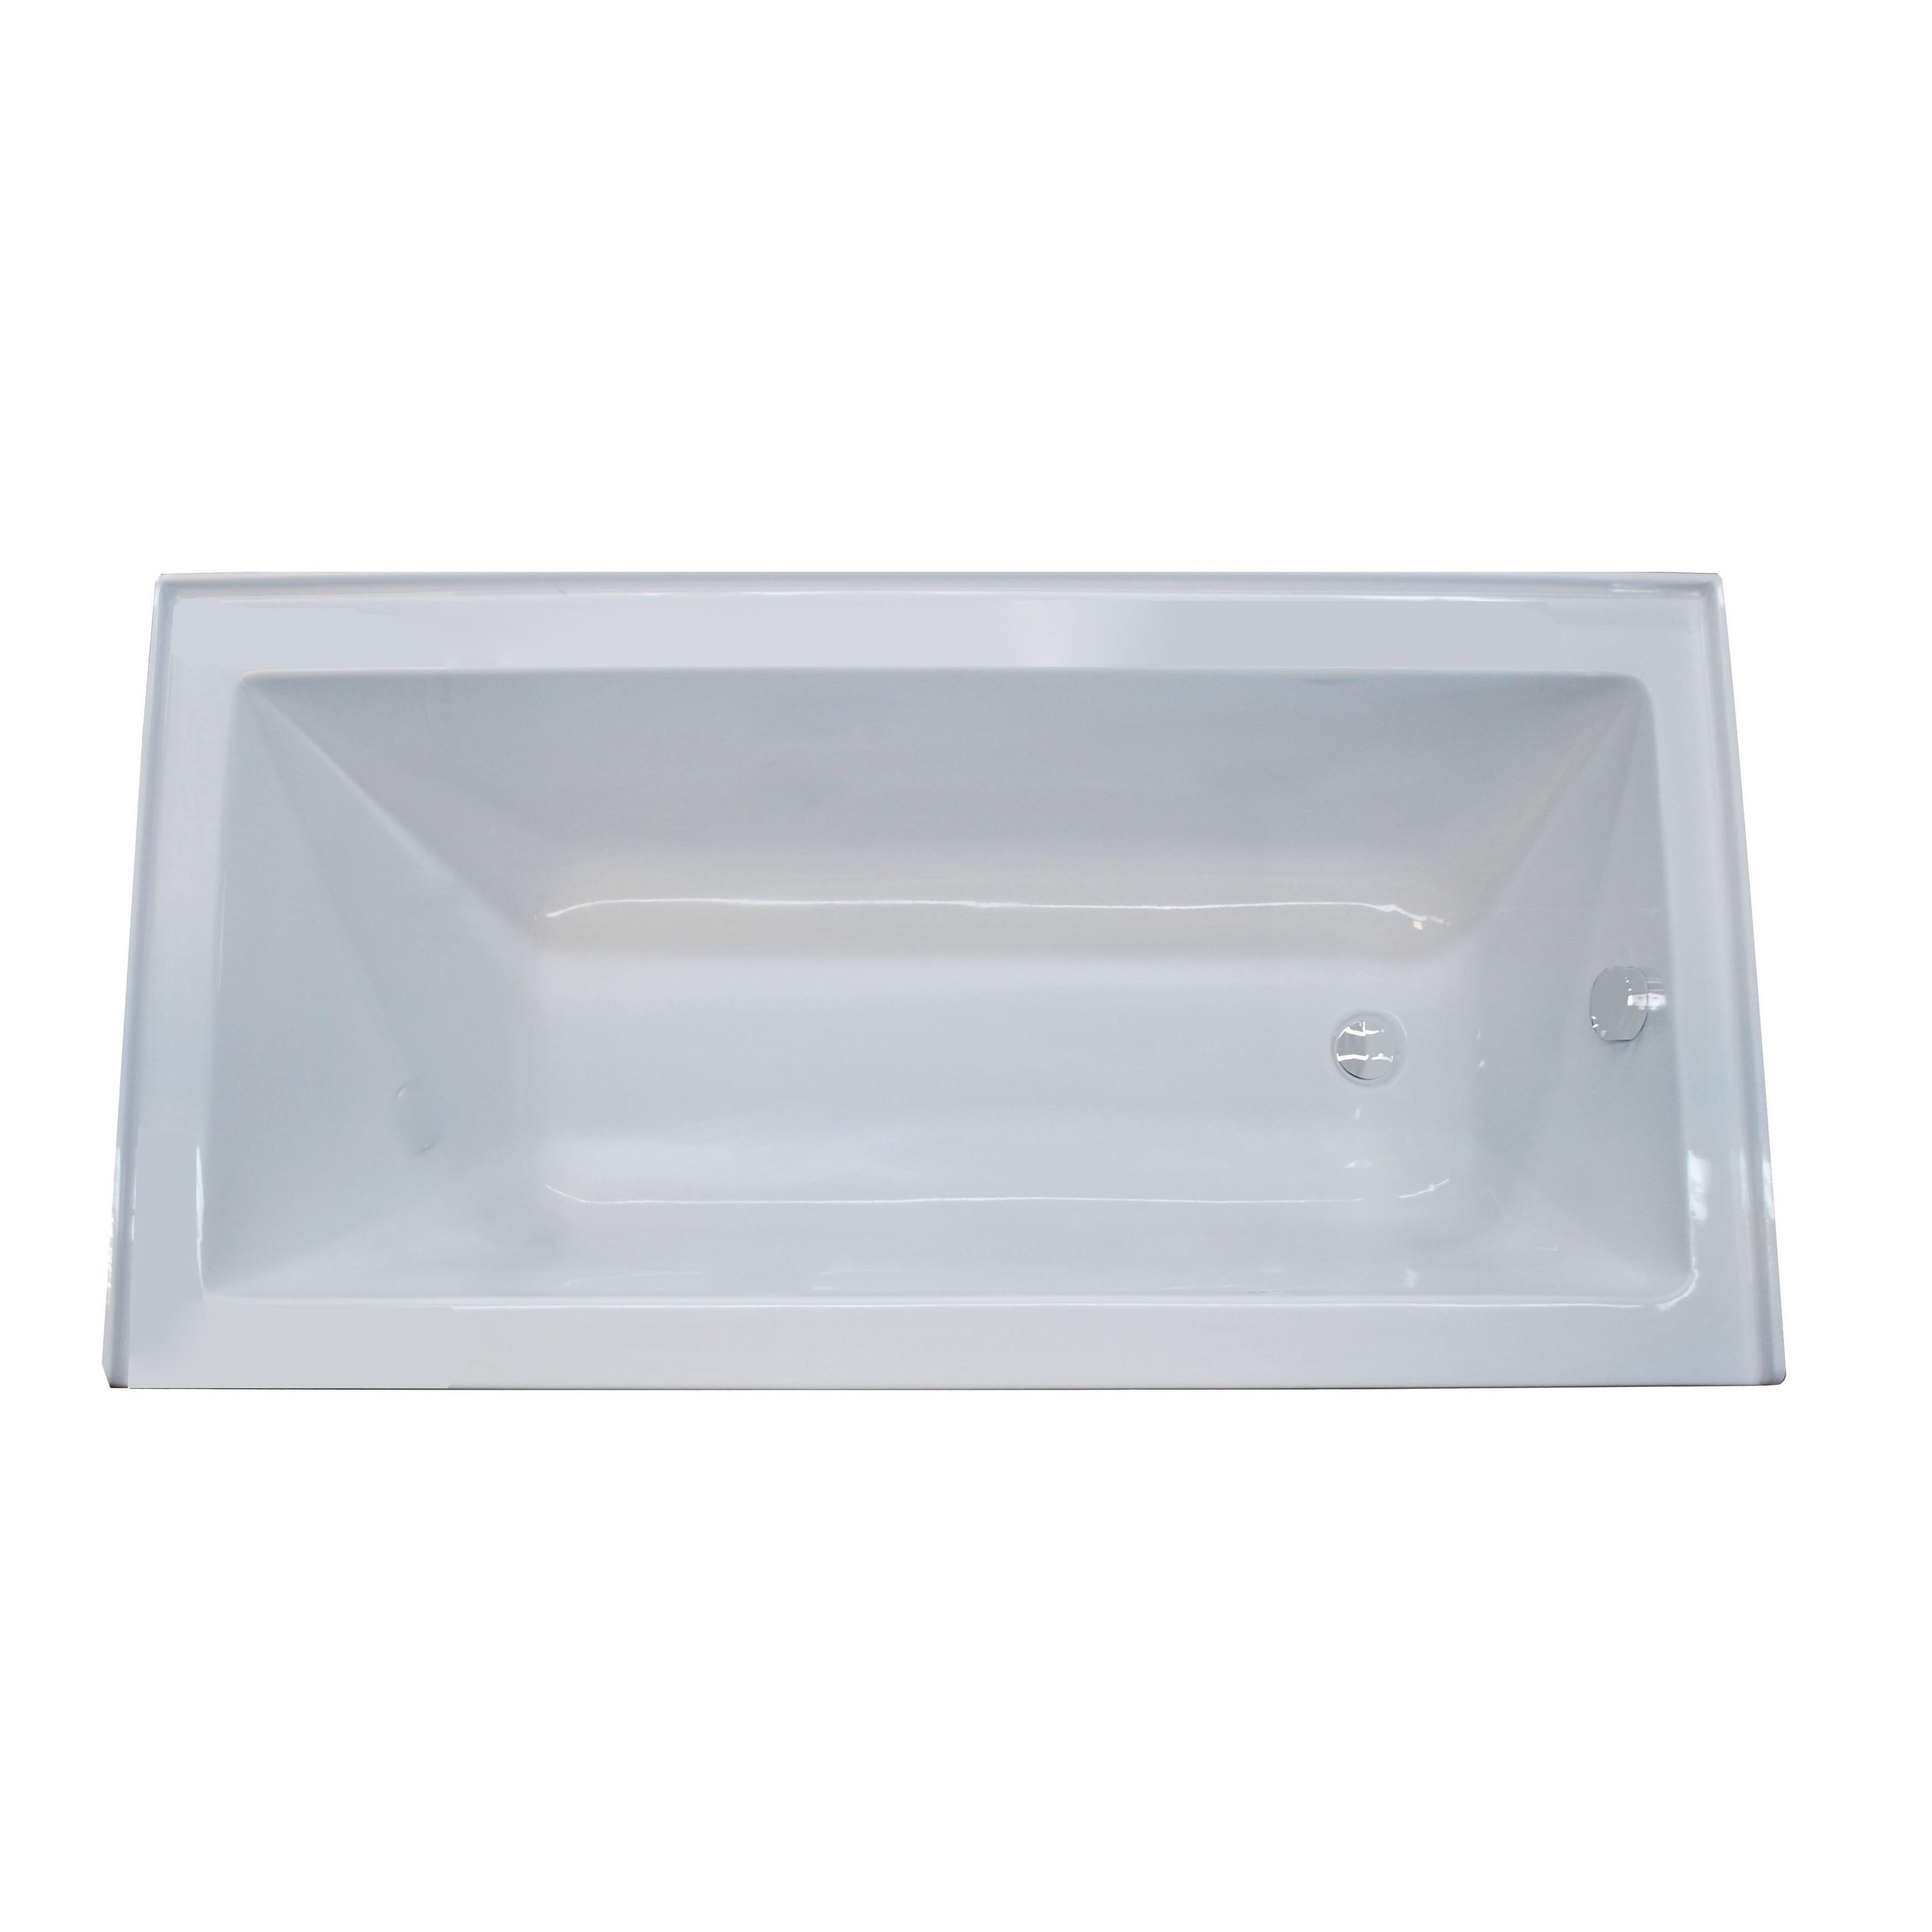 Atlantis Whirlpools Soho 30 x 60 Front Skirted Tub in White - Free ...